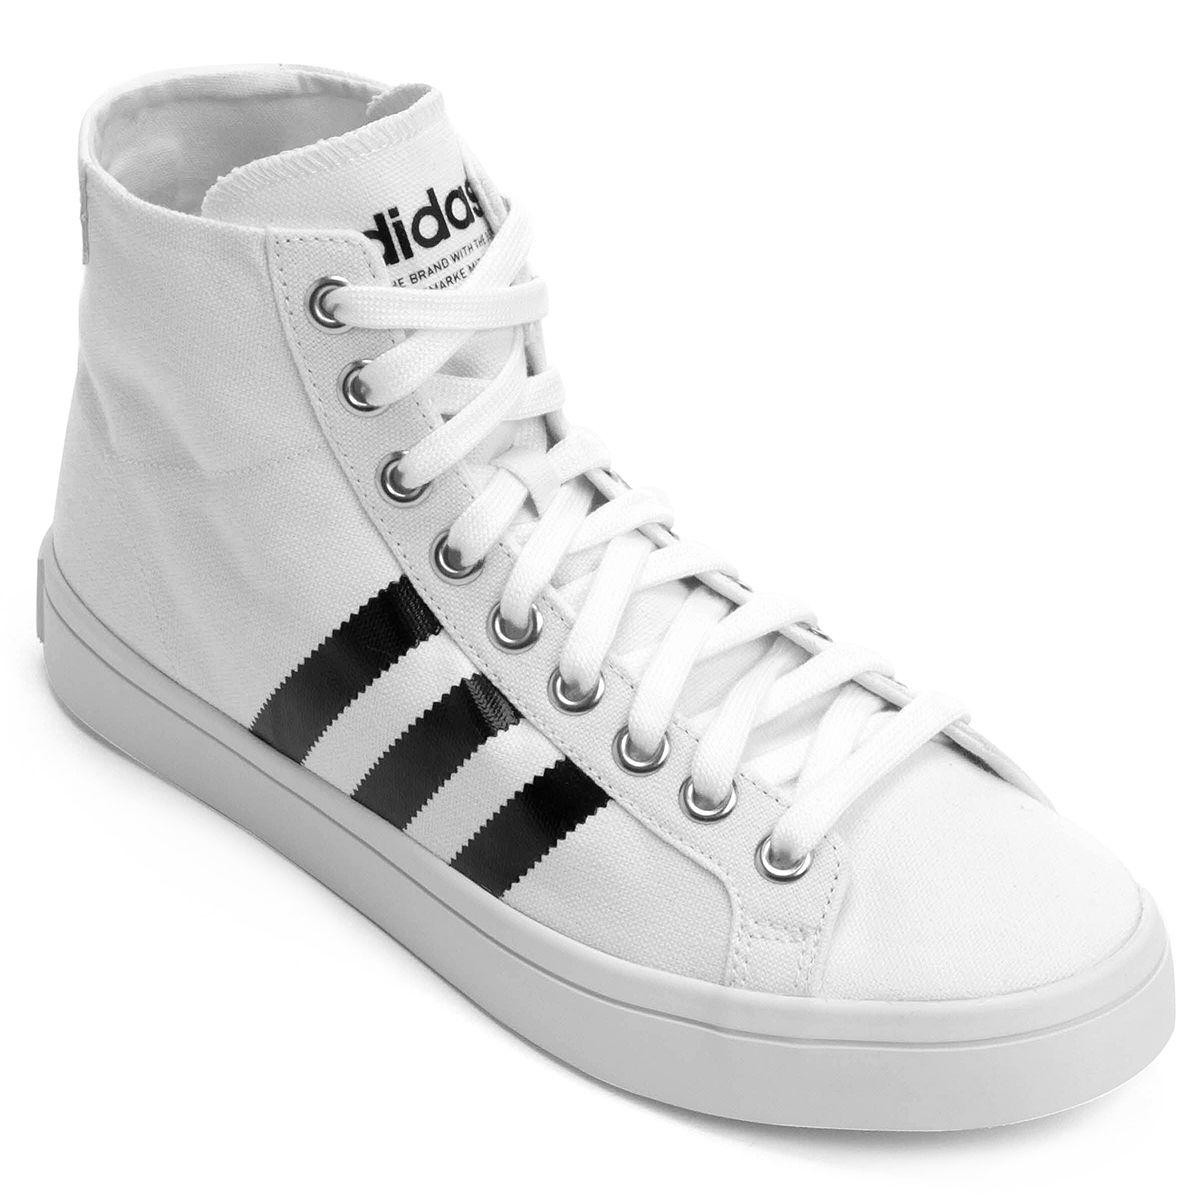 9c30ee6bf11 Tênis Adidas Courtvantage Mid - Branco e Preto